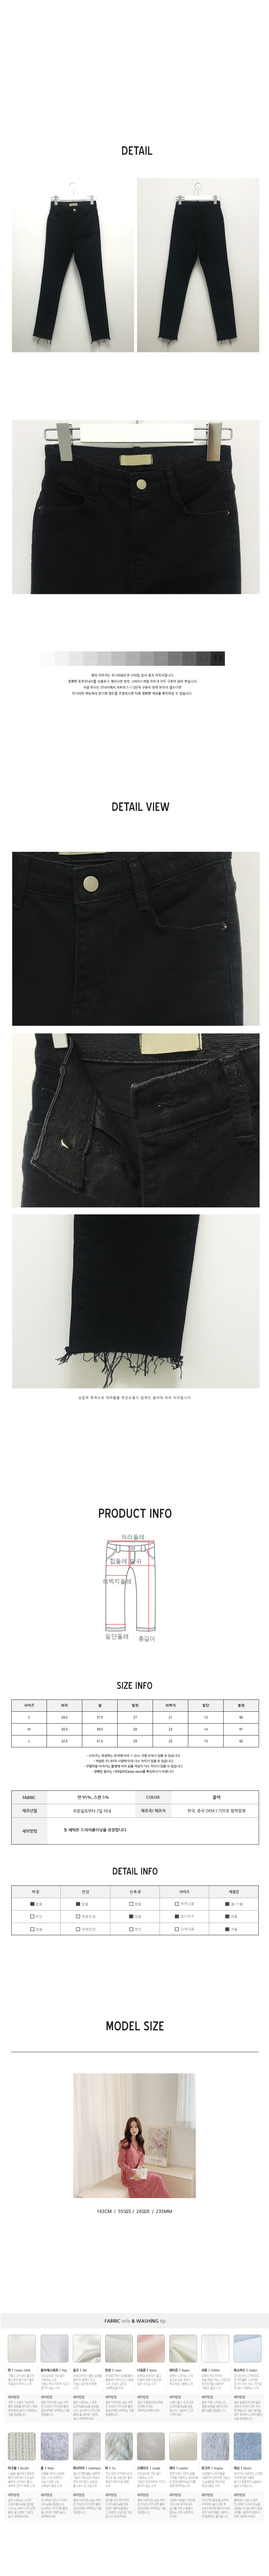 Black cutting jeans